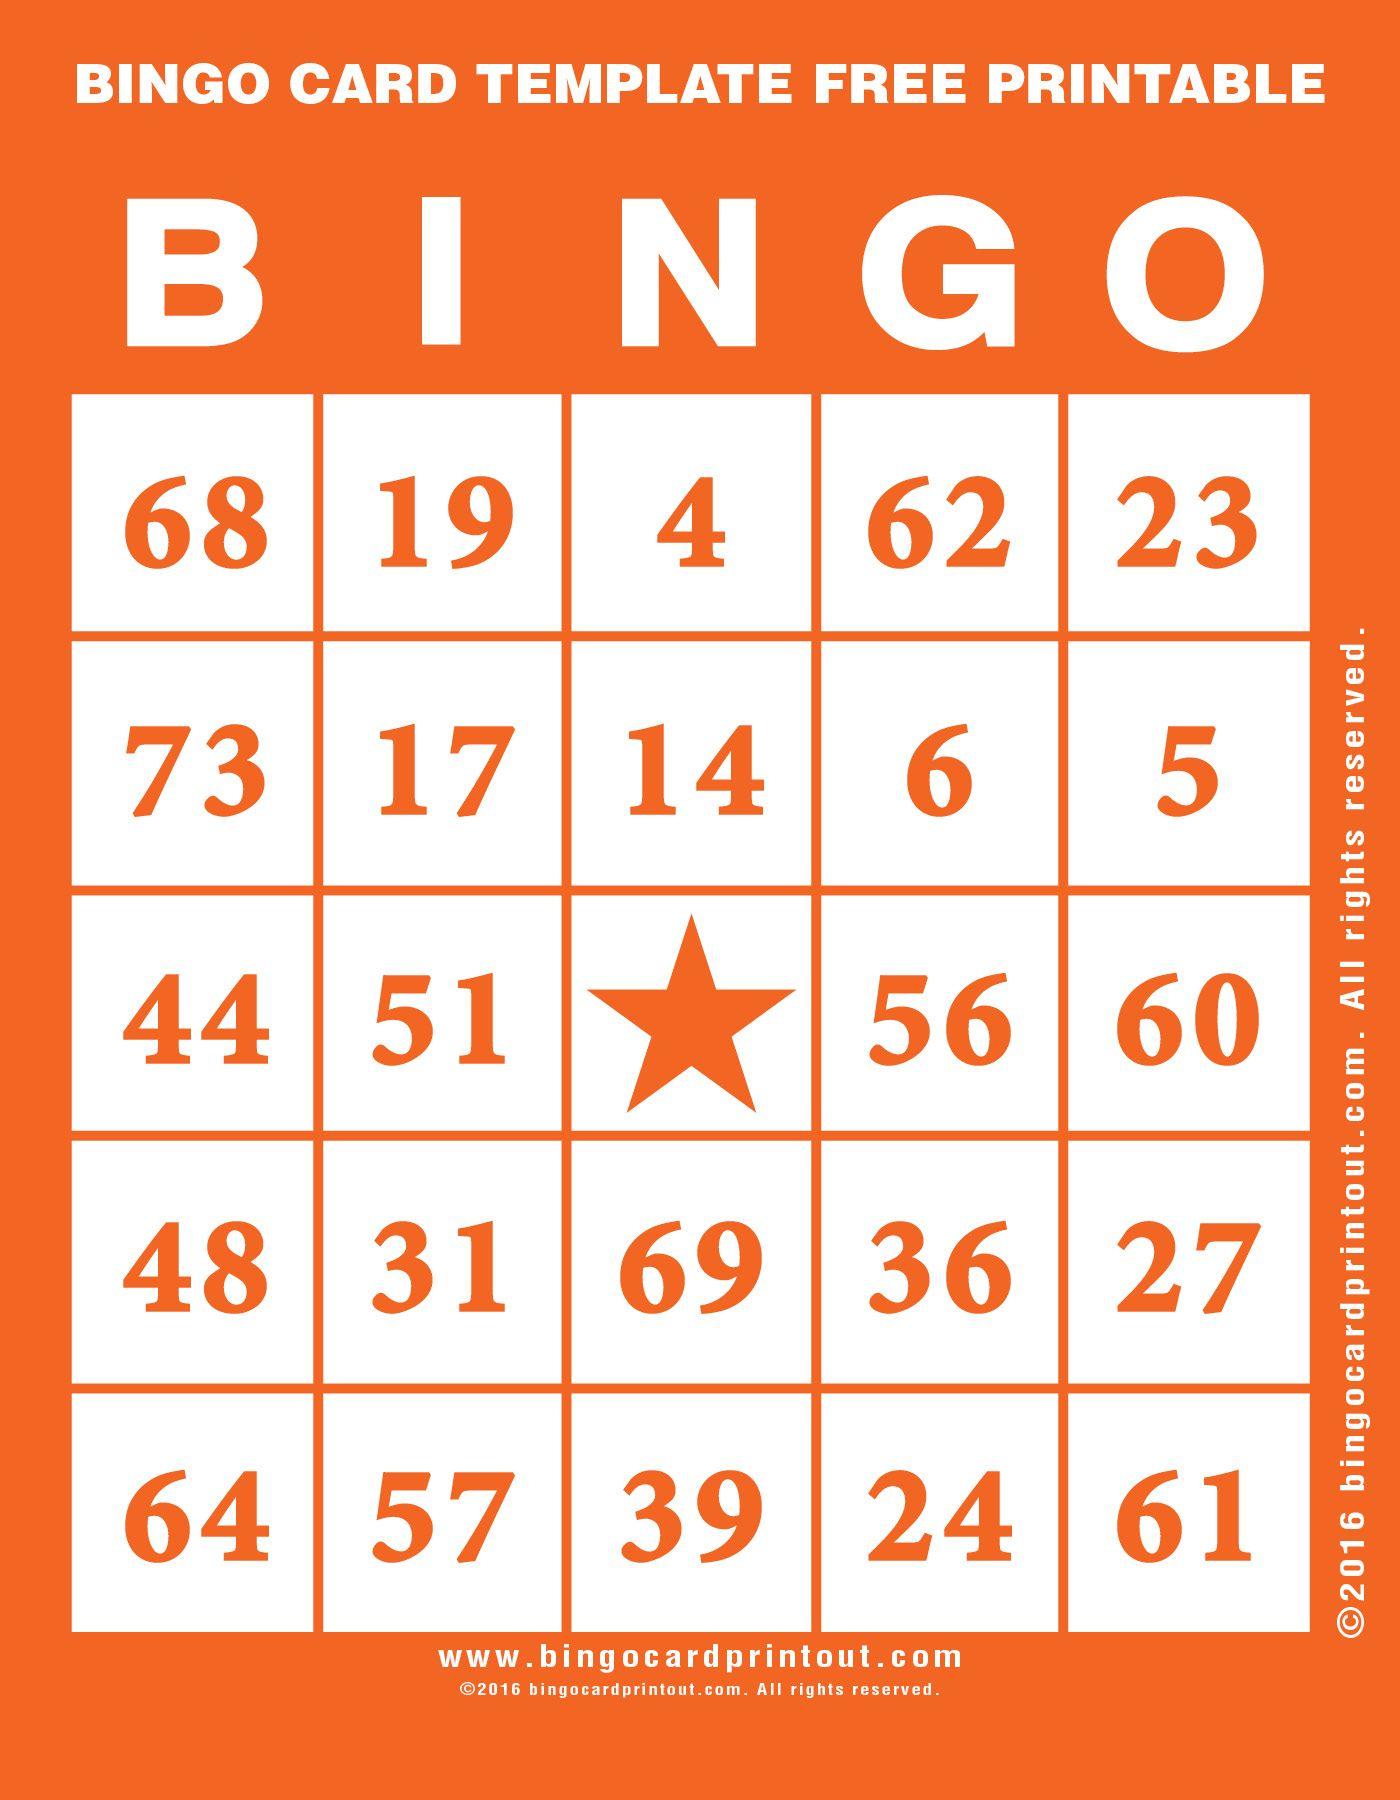 Bingo Card Template Free Printable 2   Bingo   Bingo Card Template - Free Printable Bingo Cards With Numbers